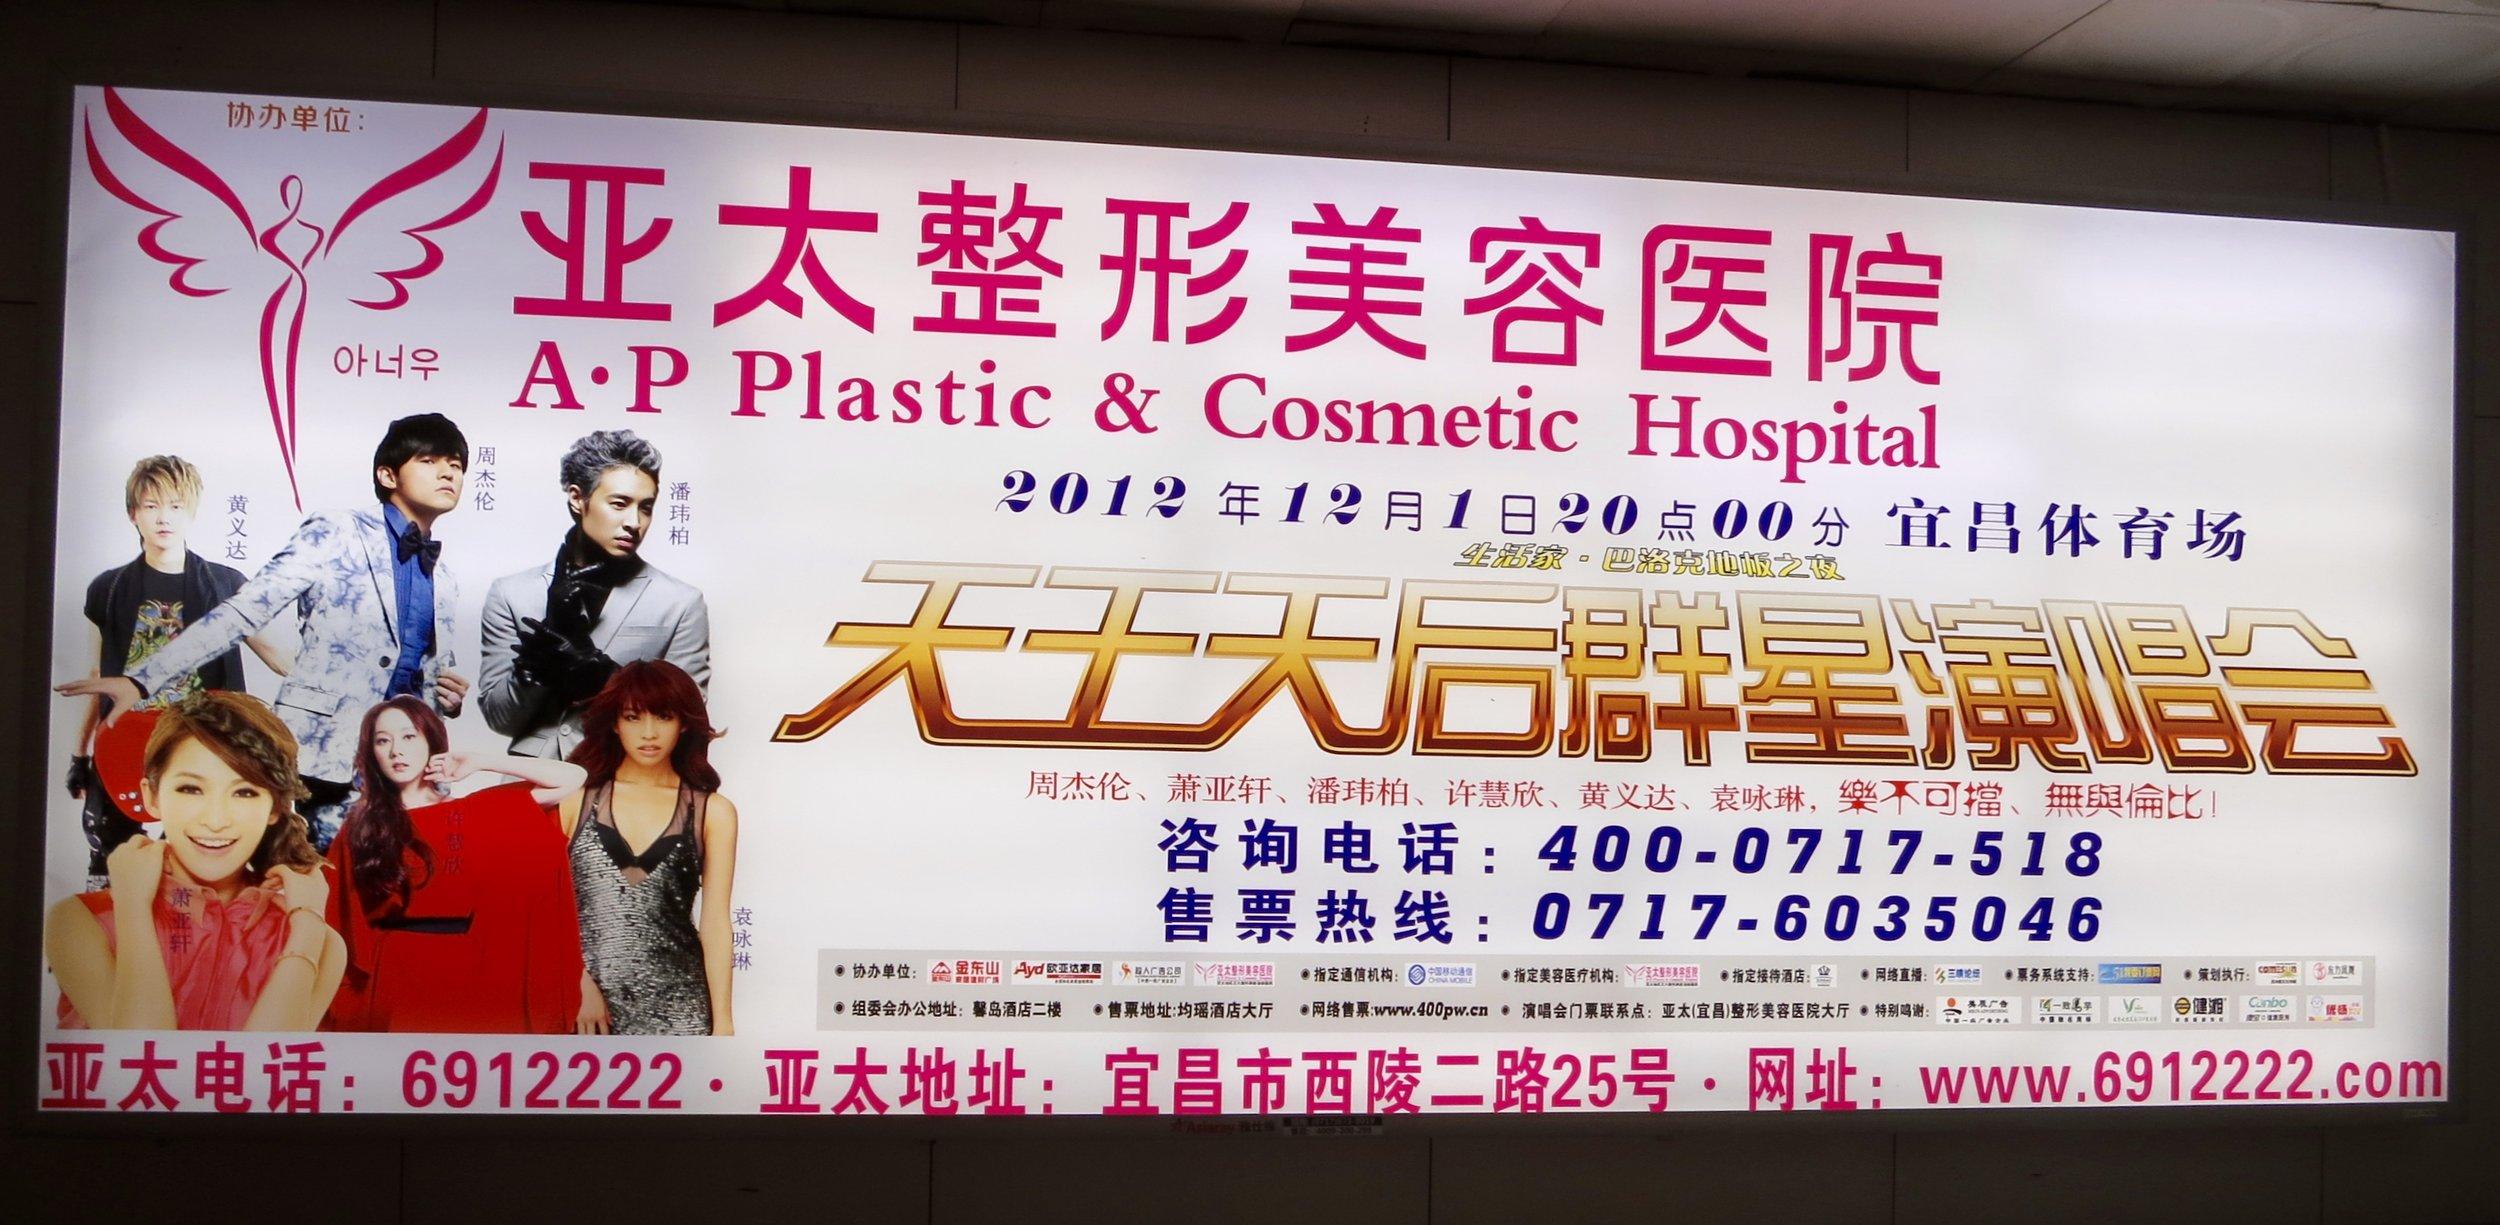 Large Billboard in Air Terminal, Shanghai